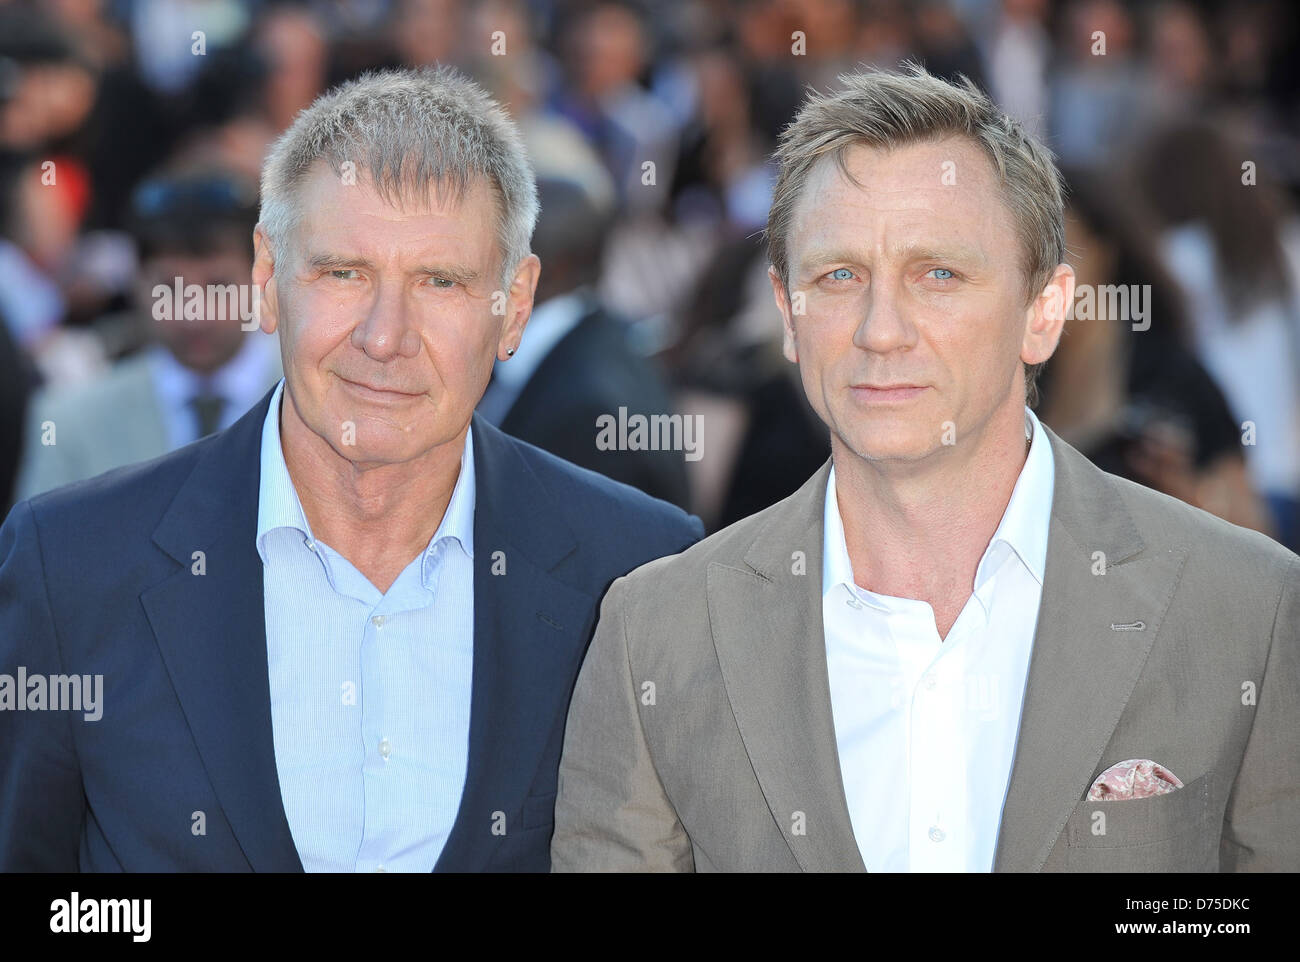 Harrison Ford and Daniel Craig Cowboys & Aliens - UK film premiere Stock  Photo - Alamy